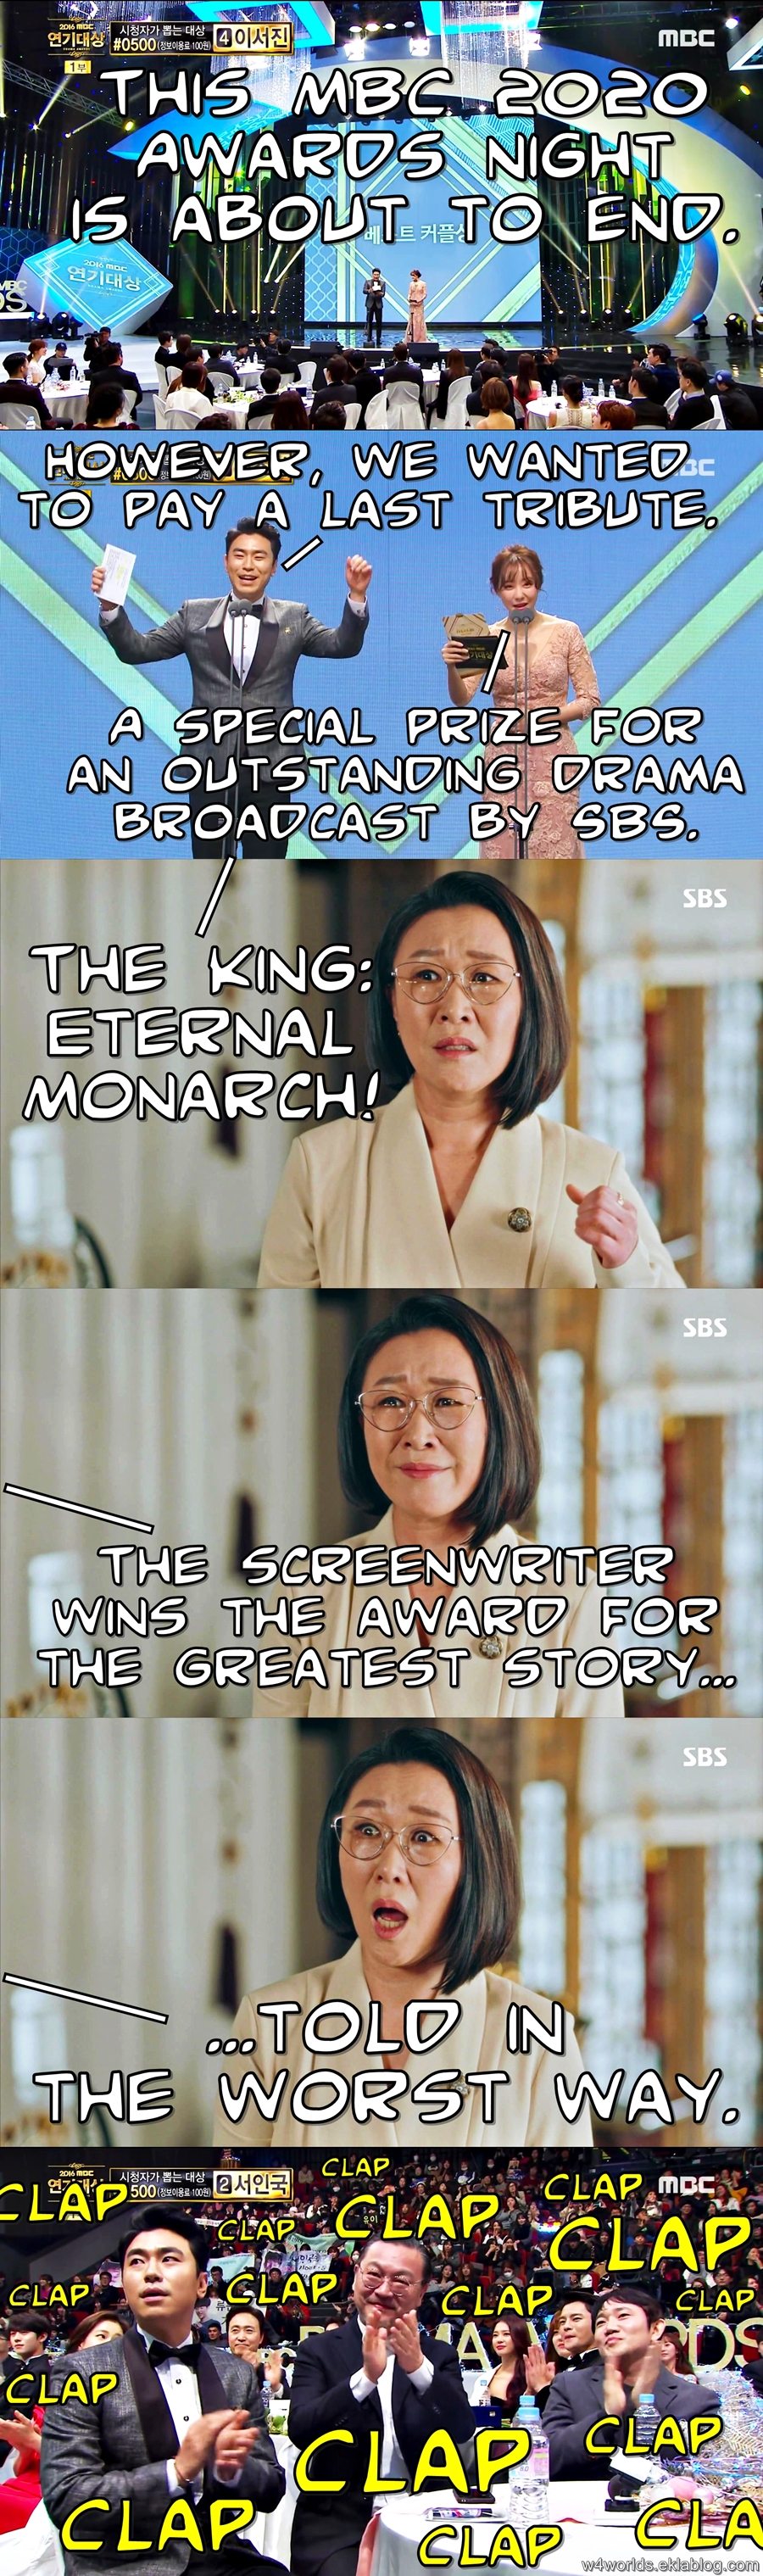 The King: Eternal Monarch Meme 11 - Drama Award